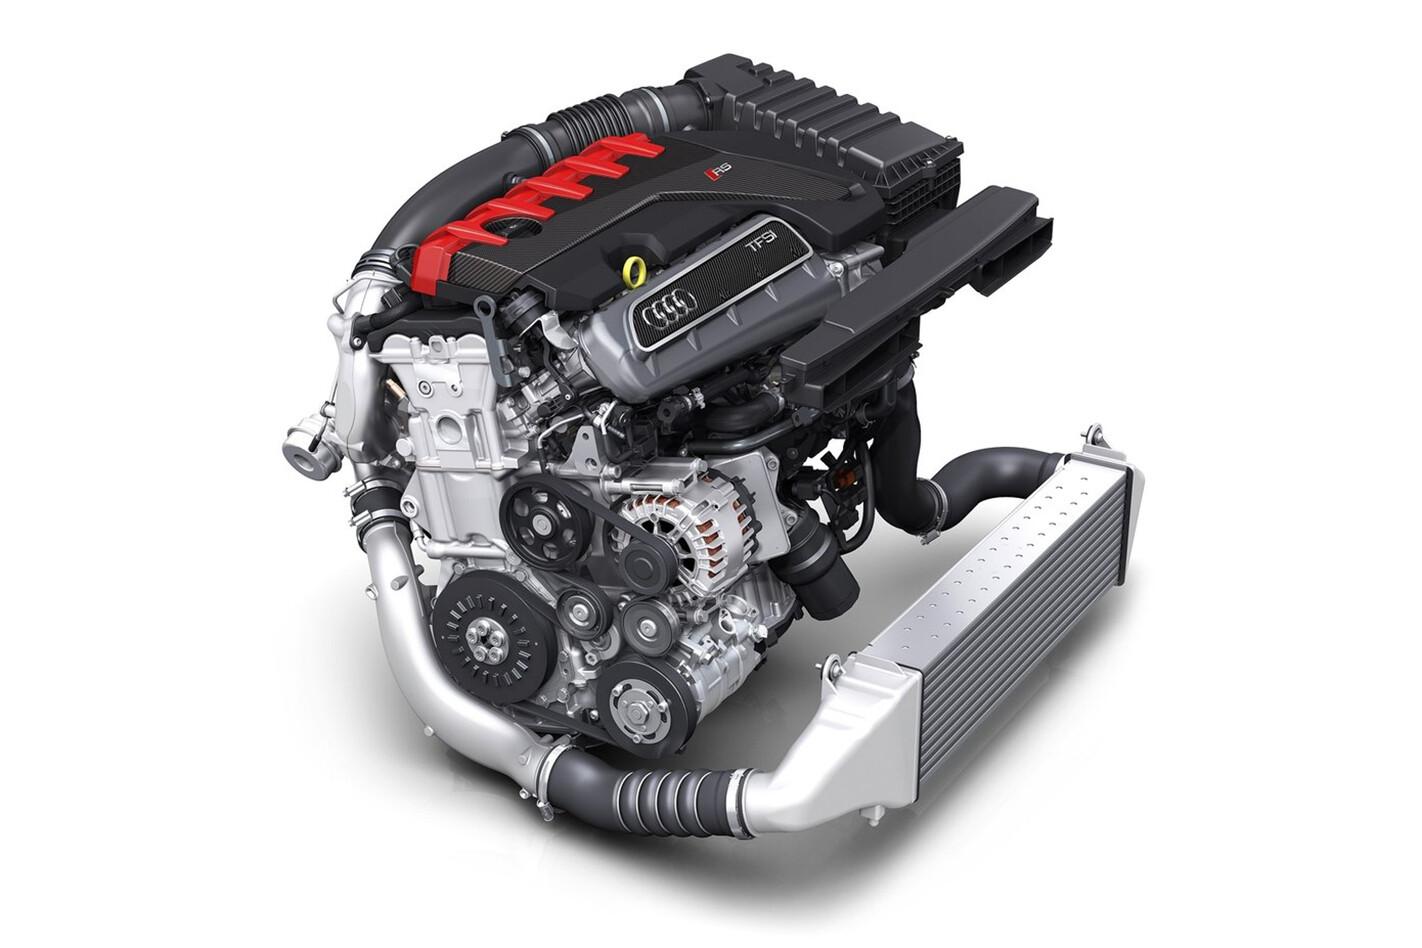 Audi TT RS 2.5 engine